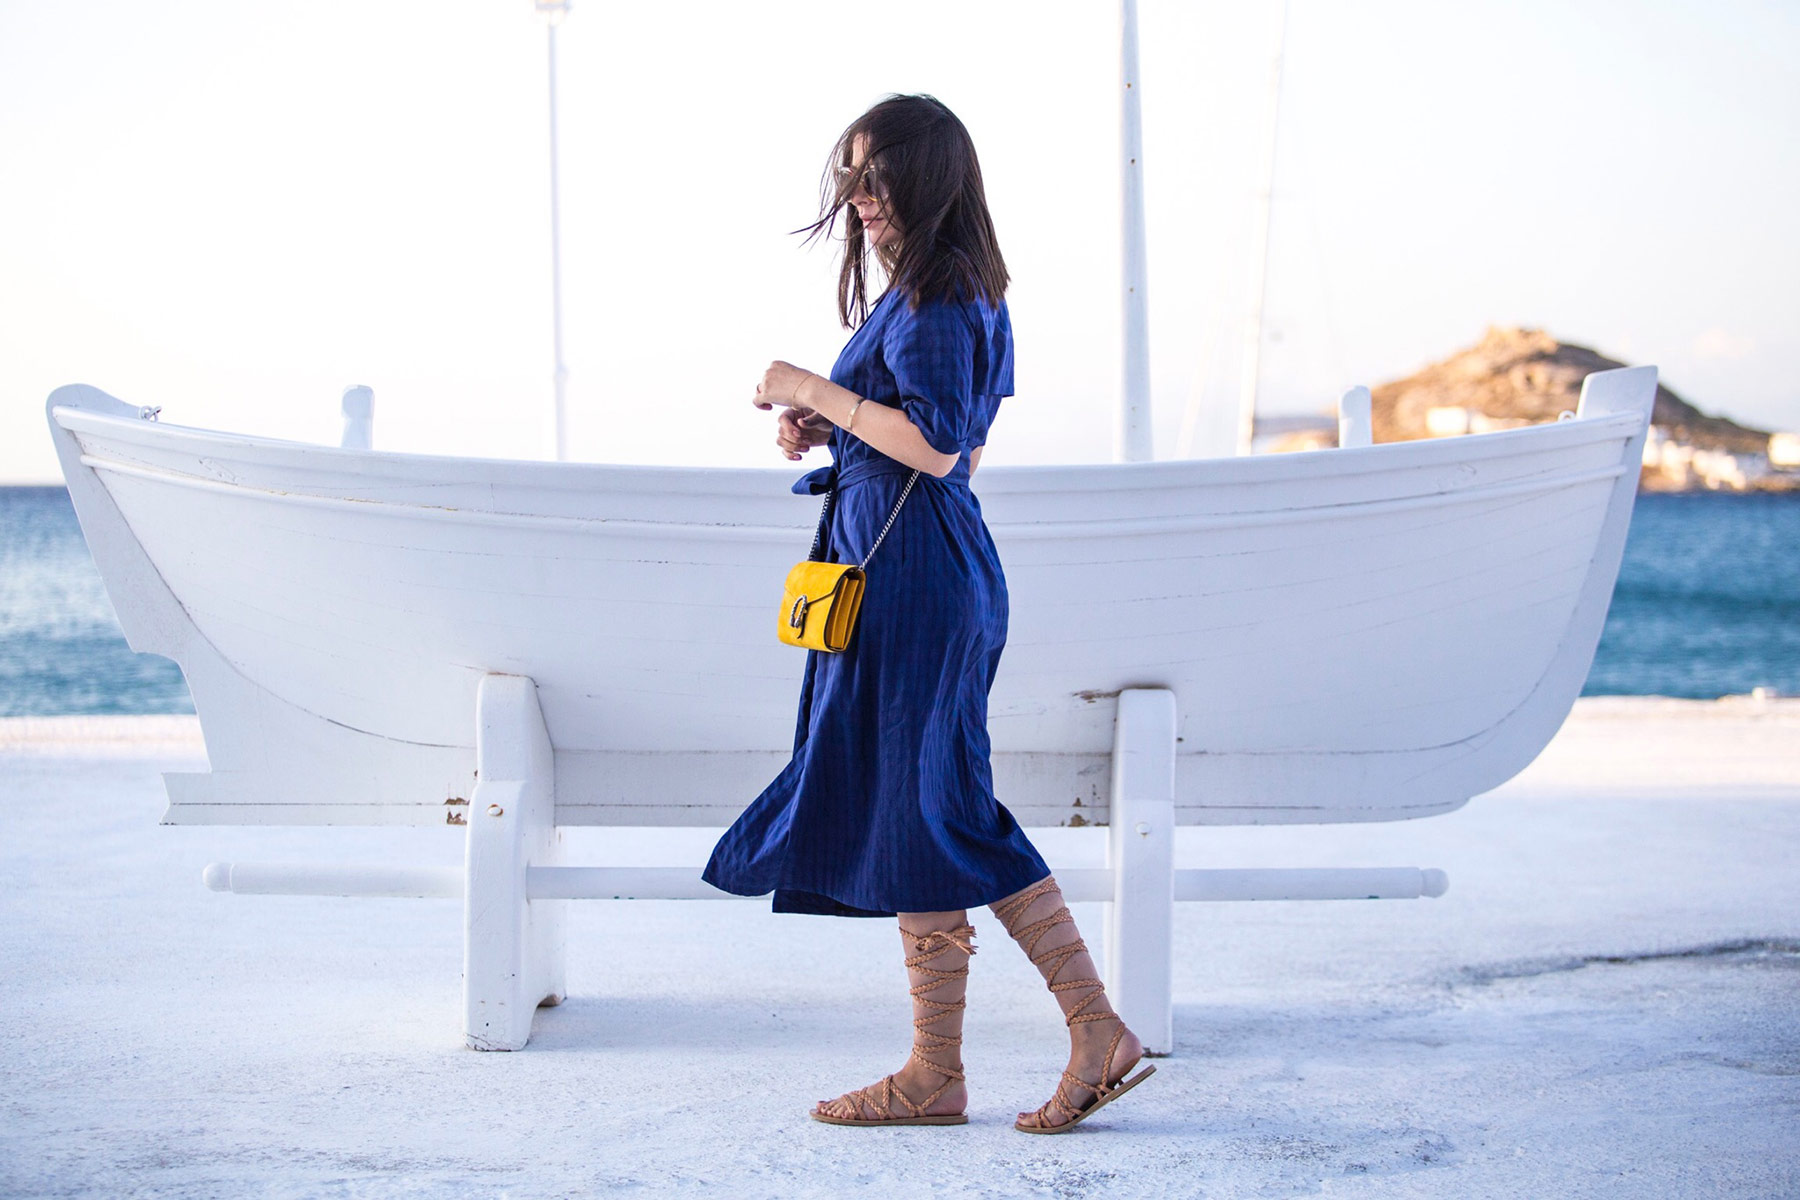 a3235e0e4ed2 Stella Asteria wearing blue dress   yellow Gucci Dionysus bag in Mykonos ...